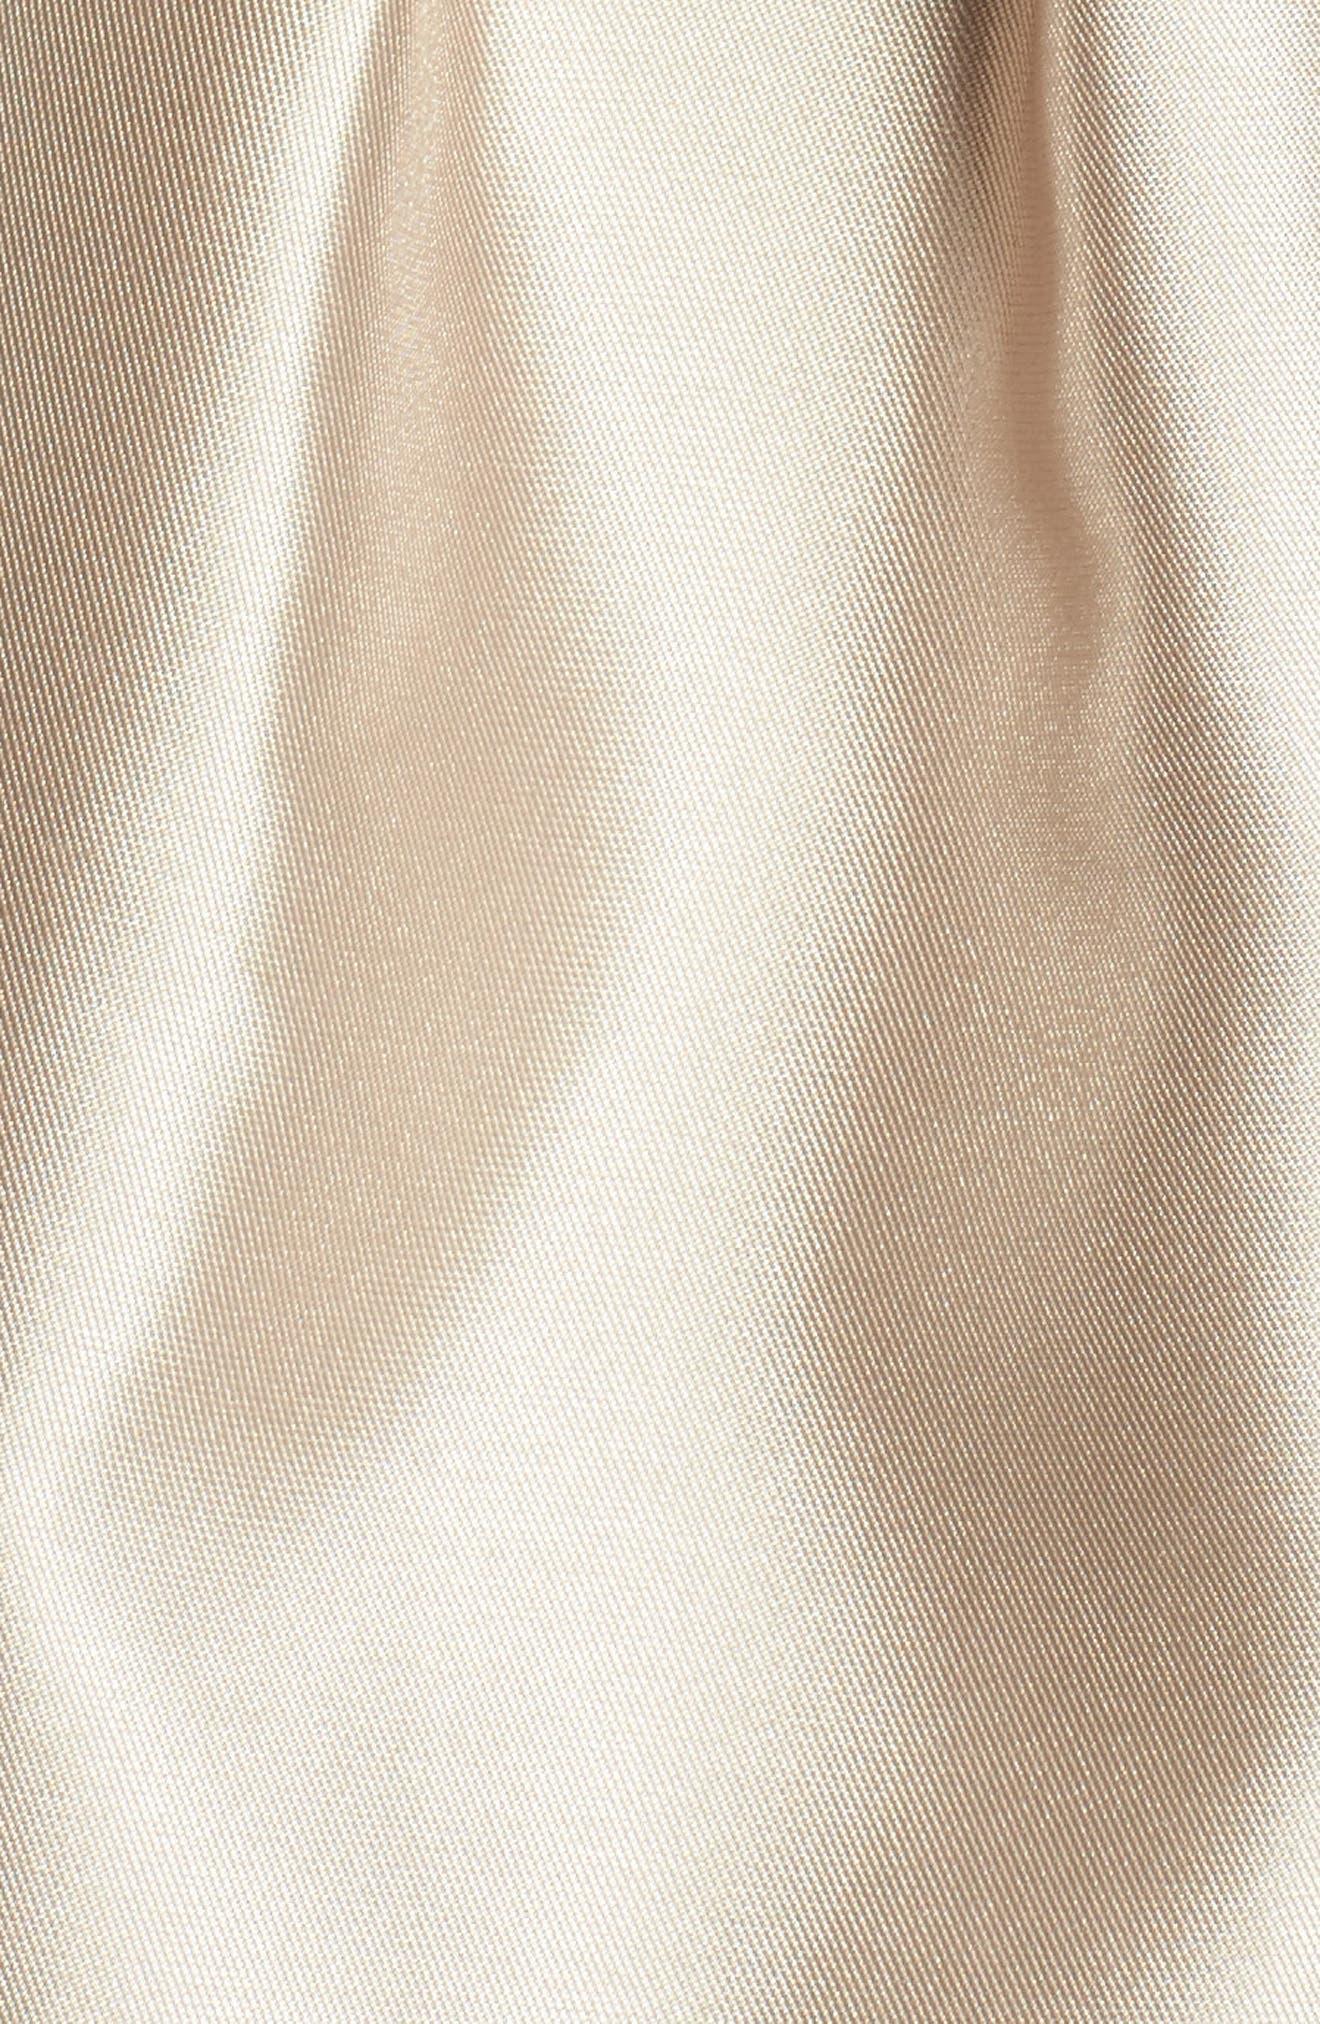 Beaded Neck Mikado Ballgown with Shawl,                             Alternate thumbnail 5, color,